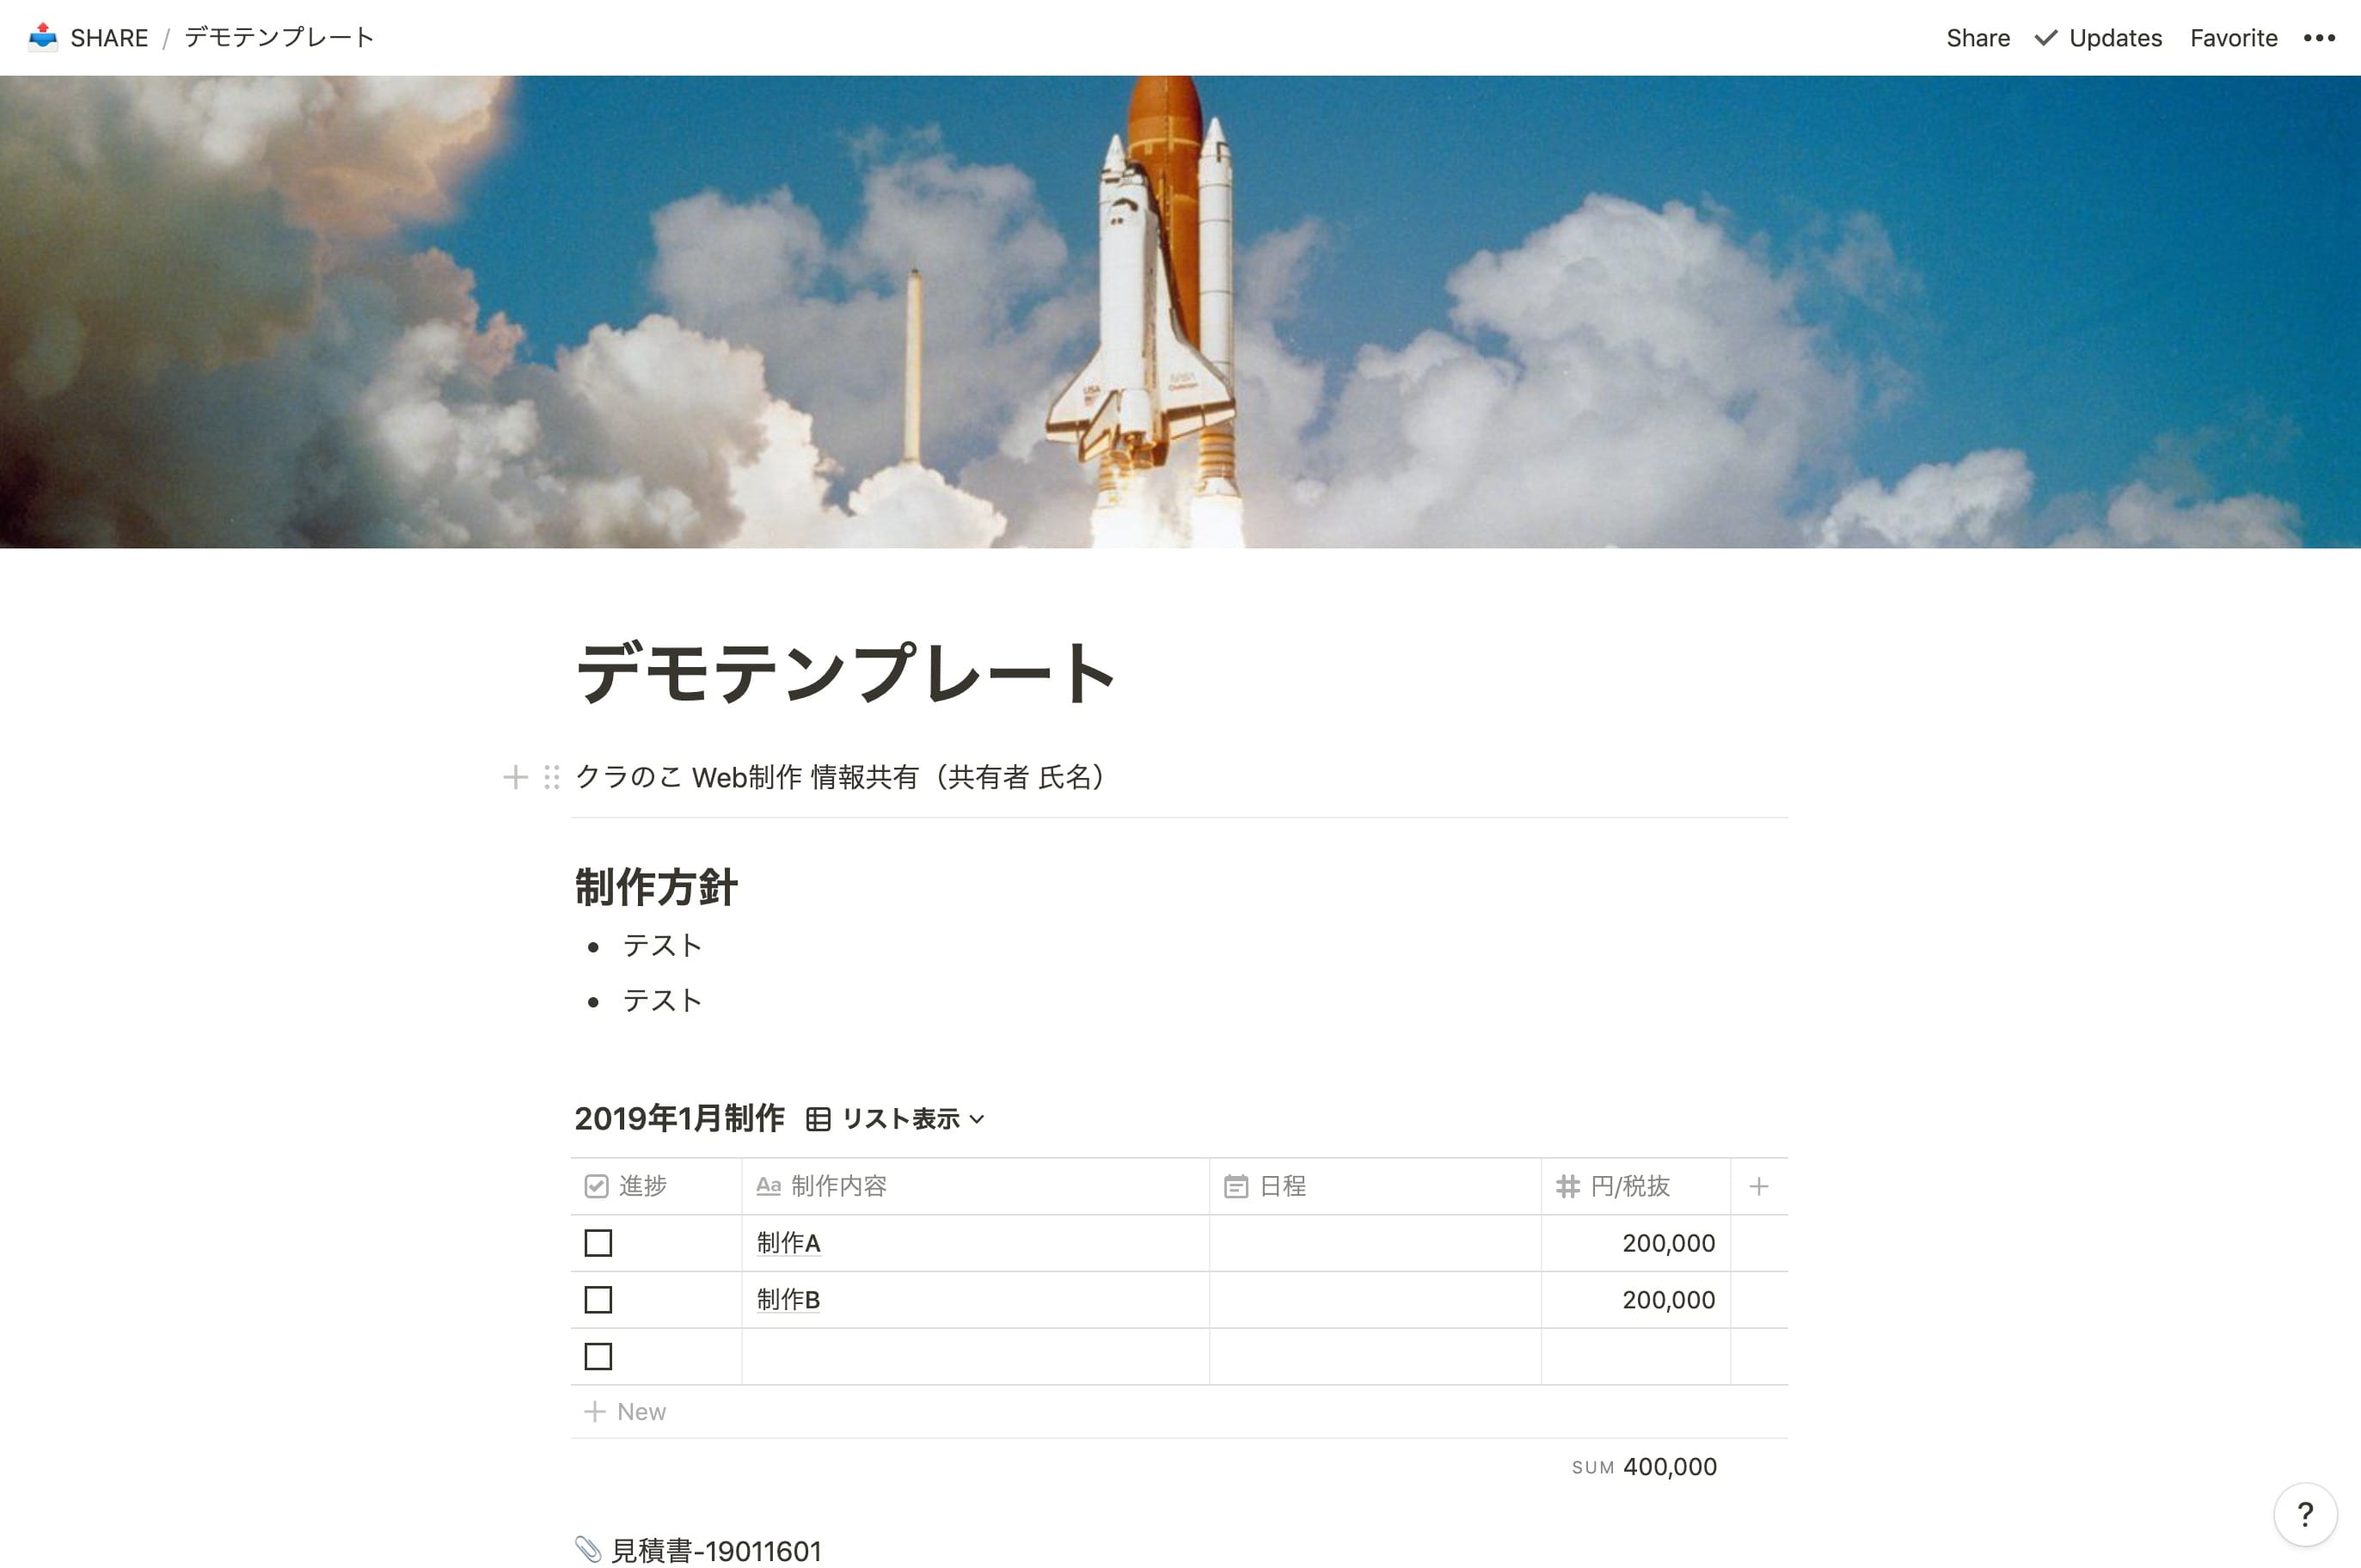 Pricing Image